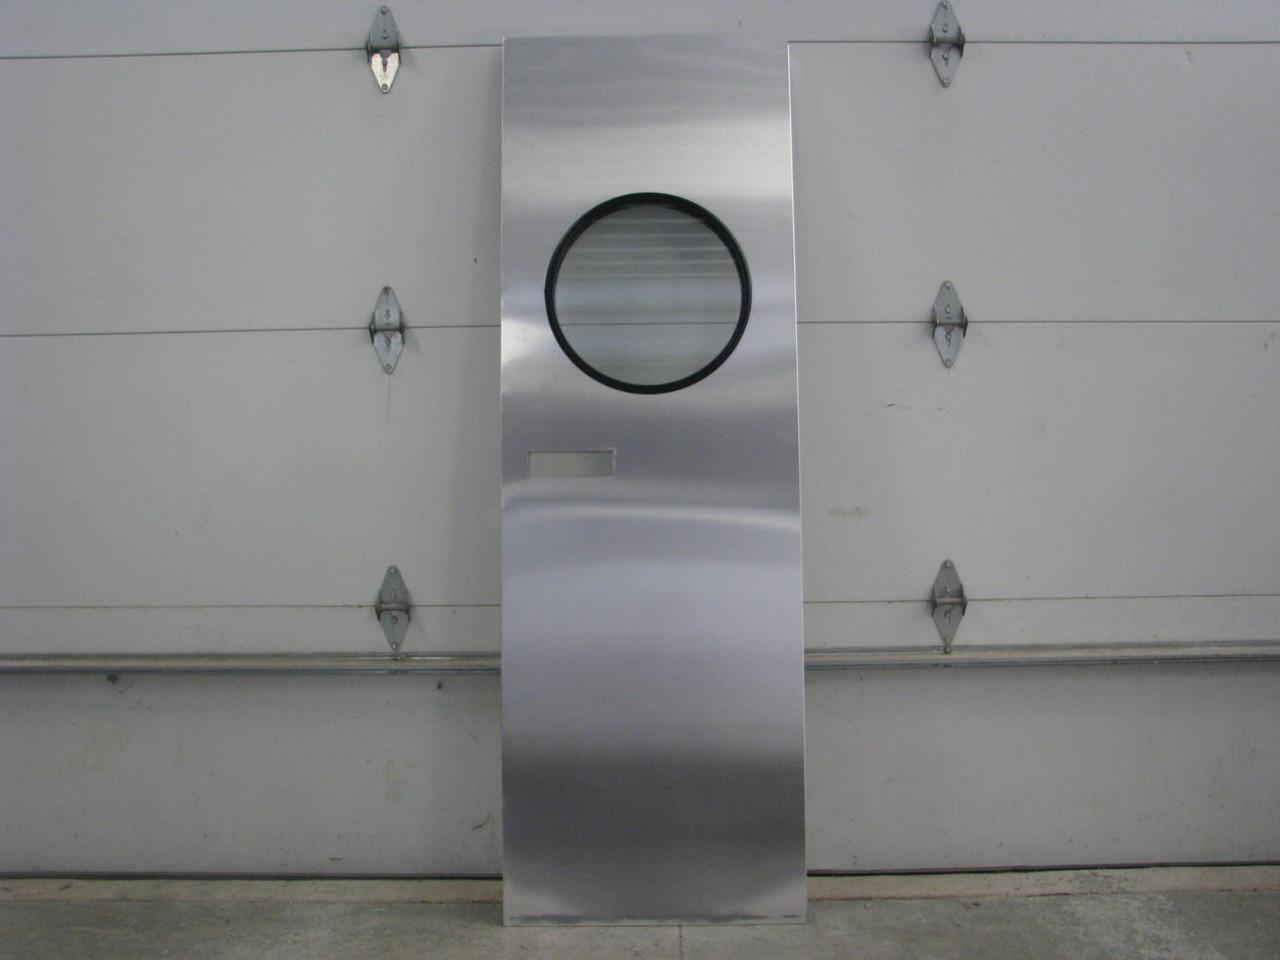 Spartan Aluminum Entry Door (1953-1958) (CBP043)